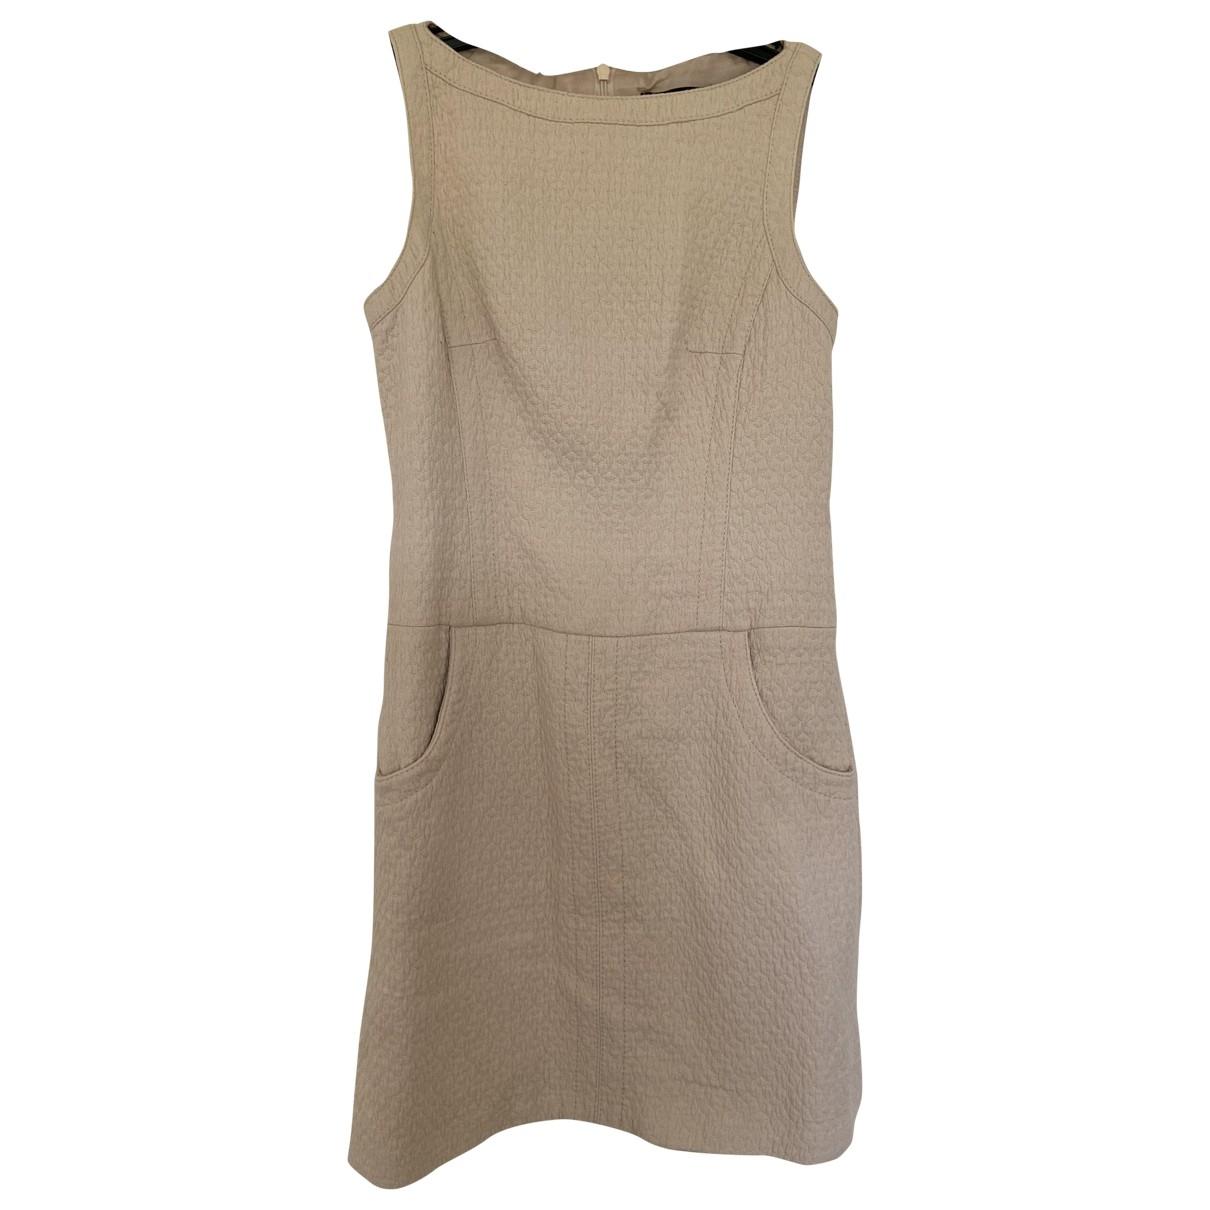 Karen Millen \N Kleid in  Beige Baumwolle